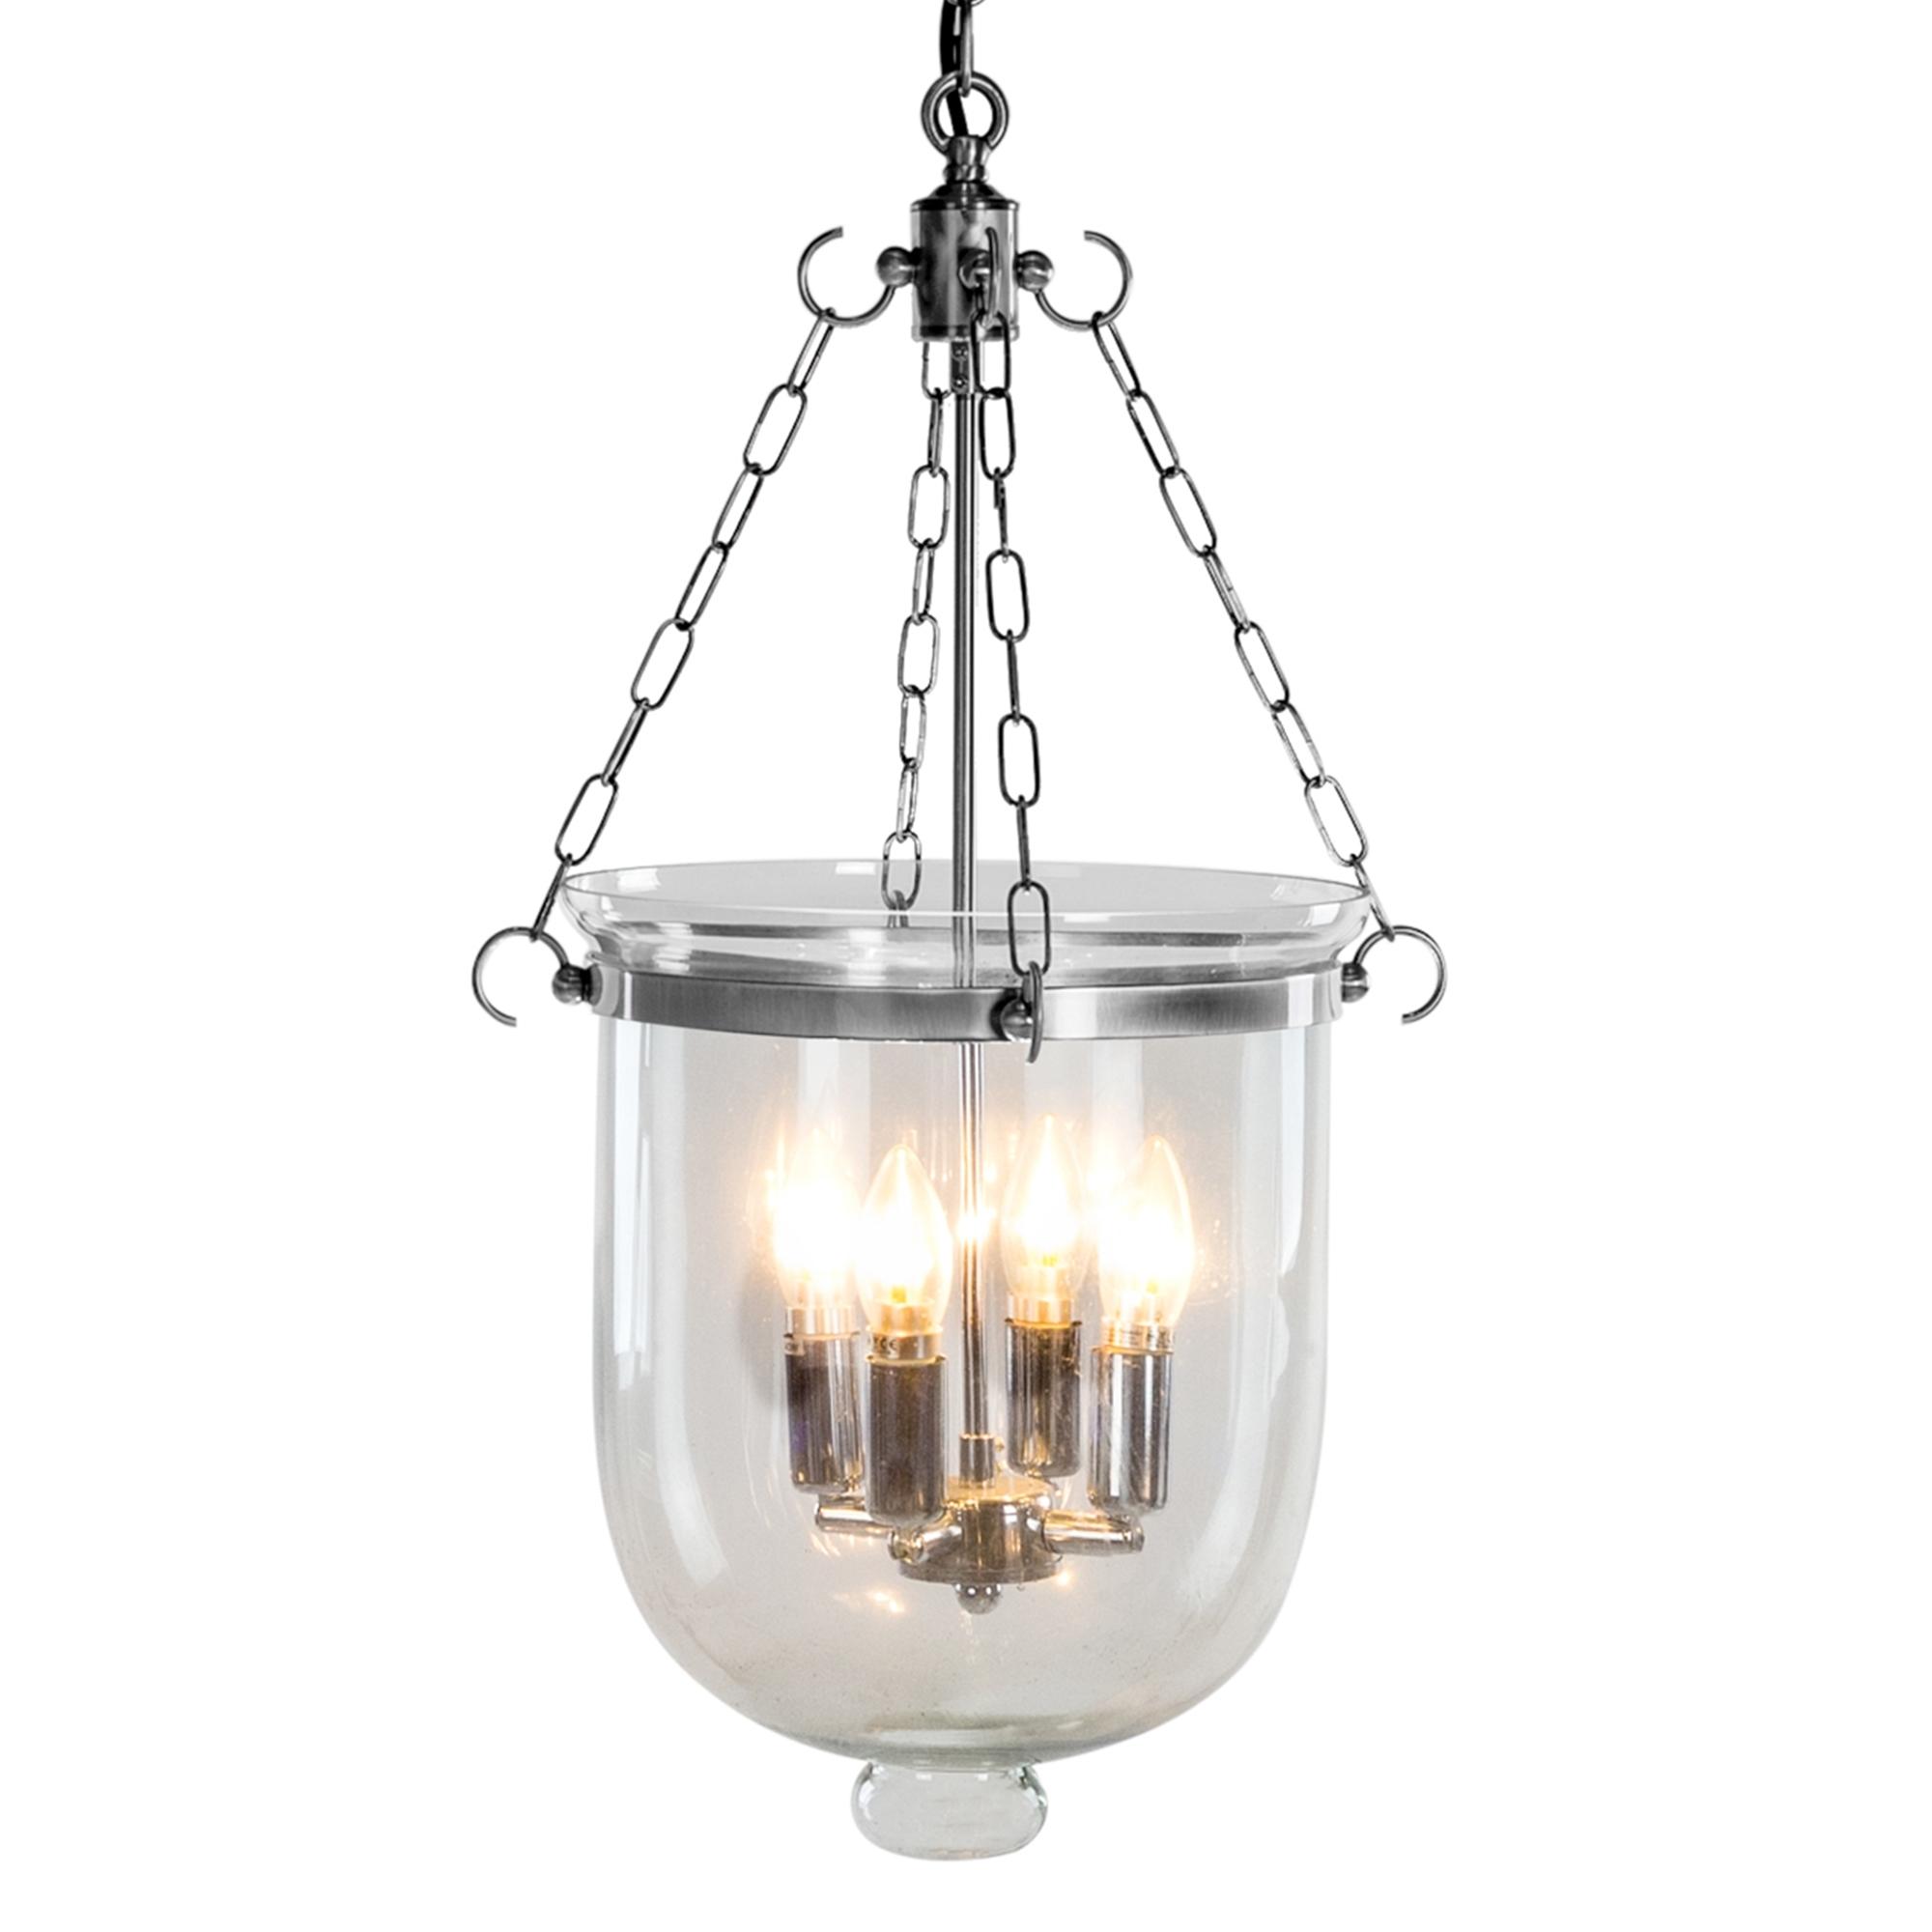 Chrome Glass Bell Jar Chandelier